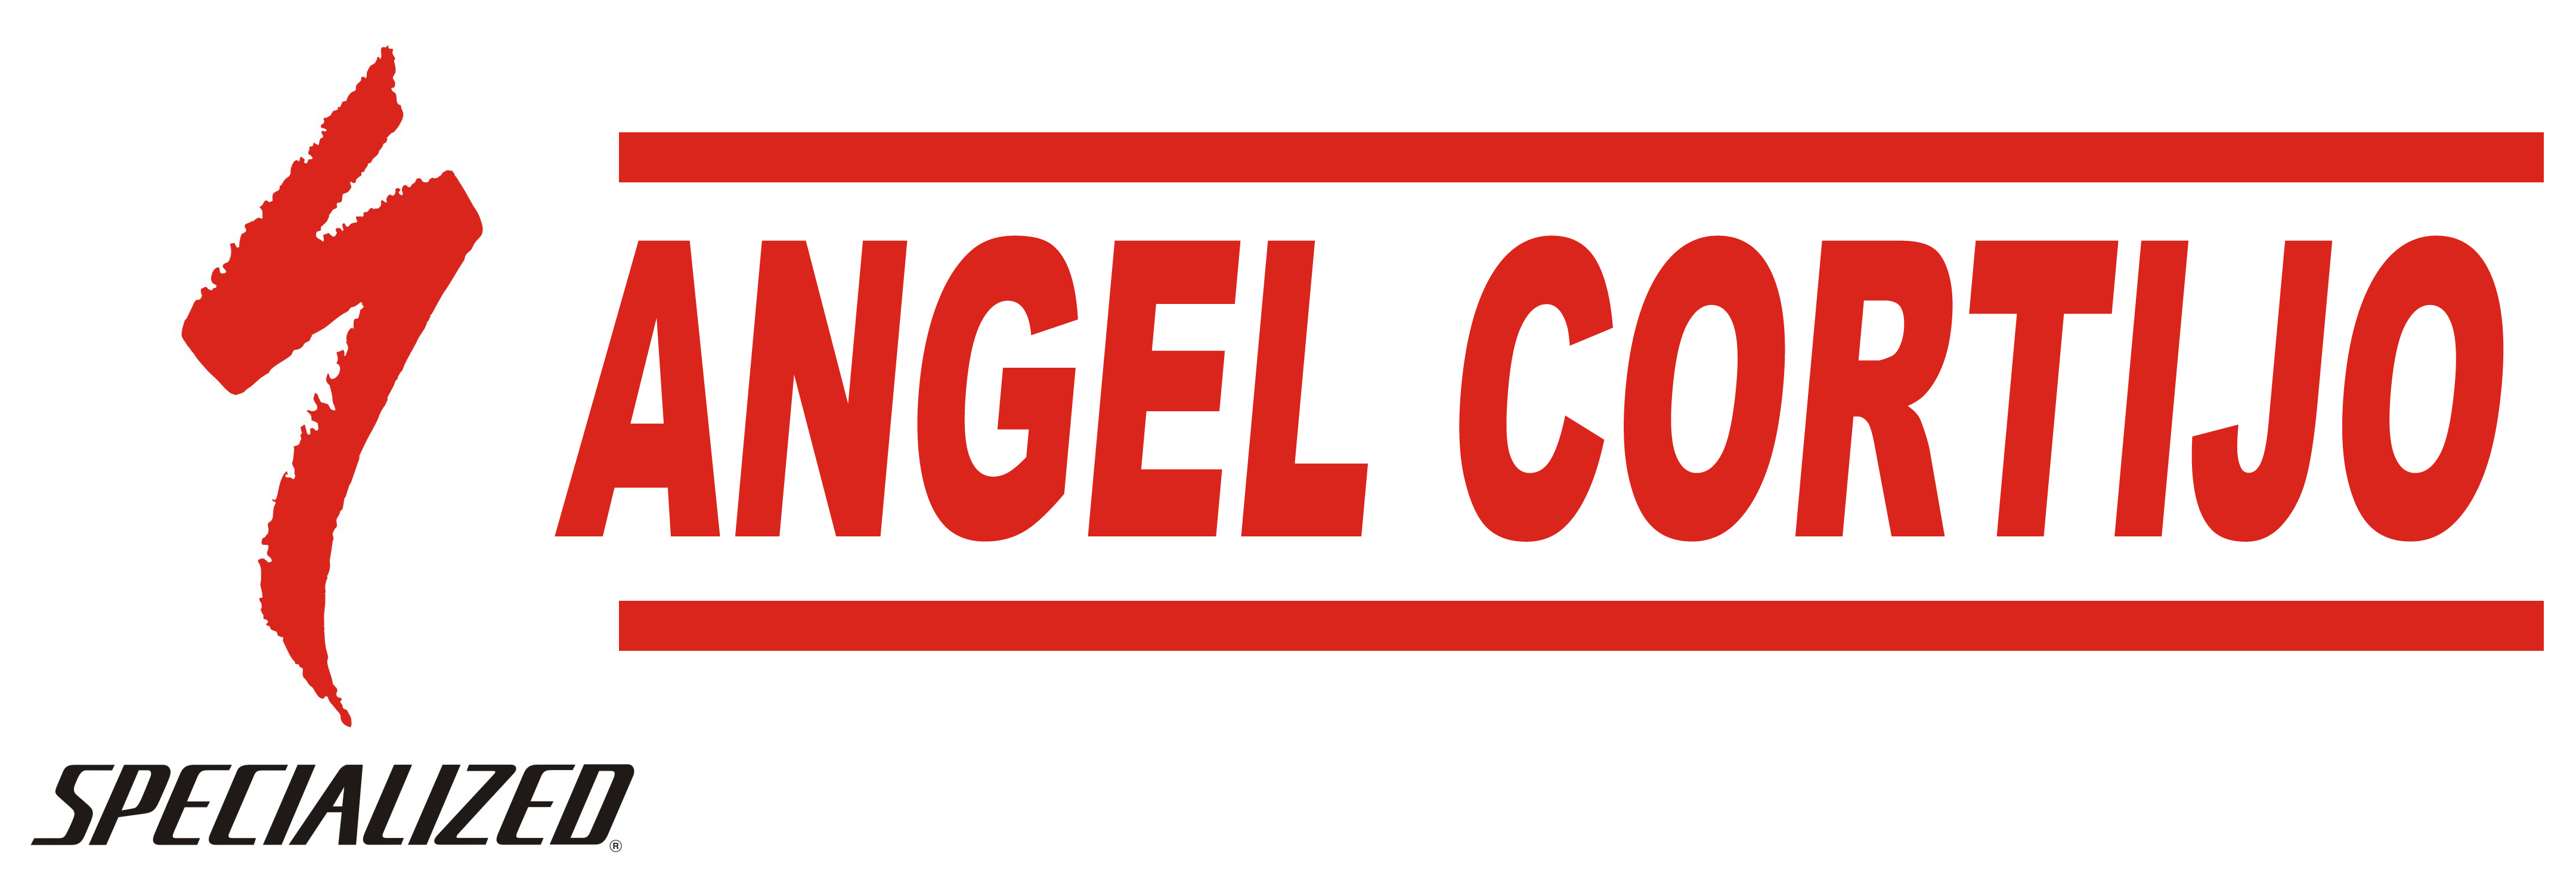 Angel cortijo bicicletas badajoz for Distribuidora de recambios badajoz